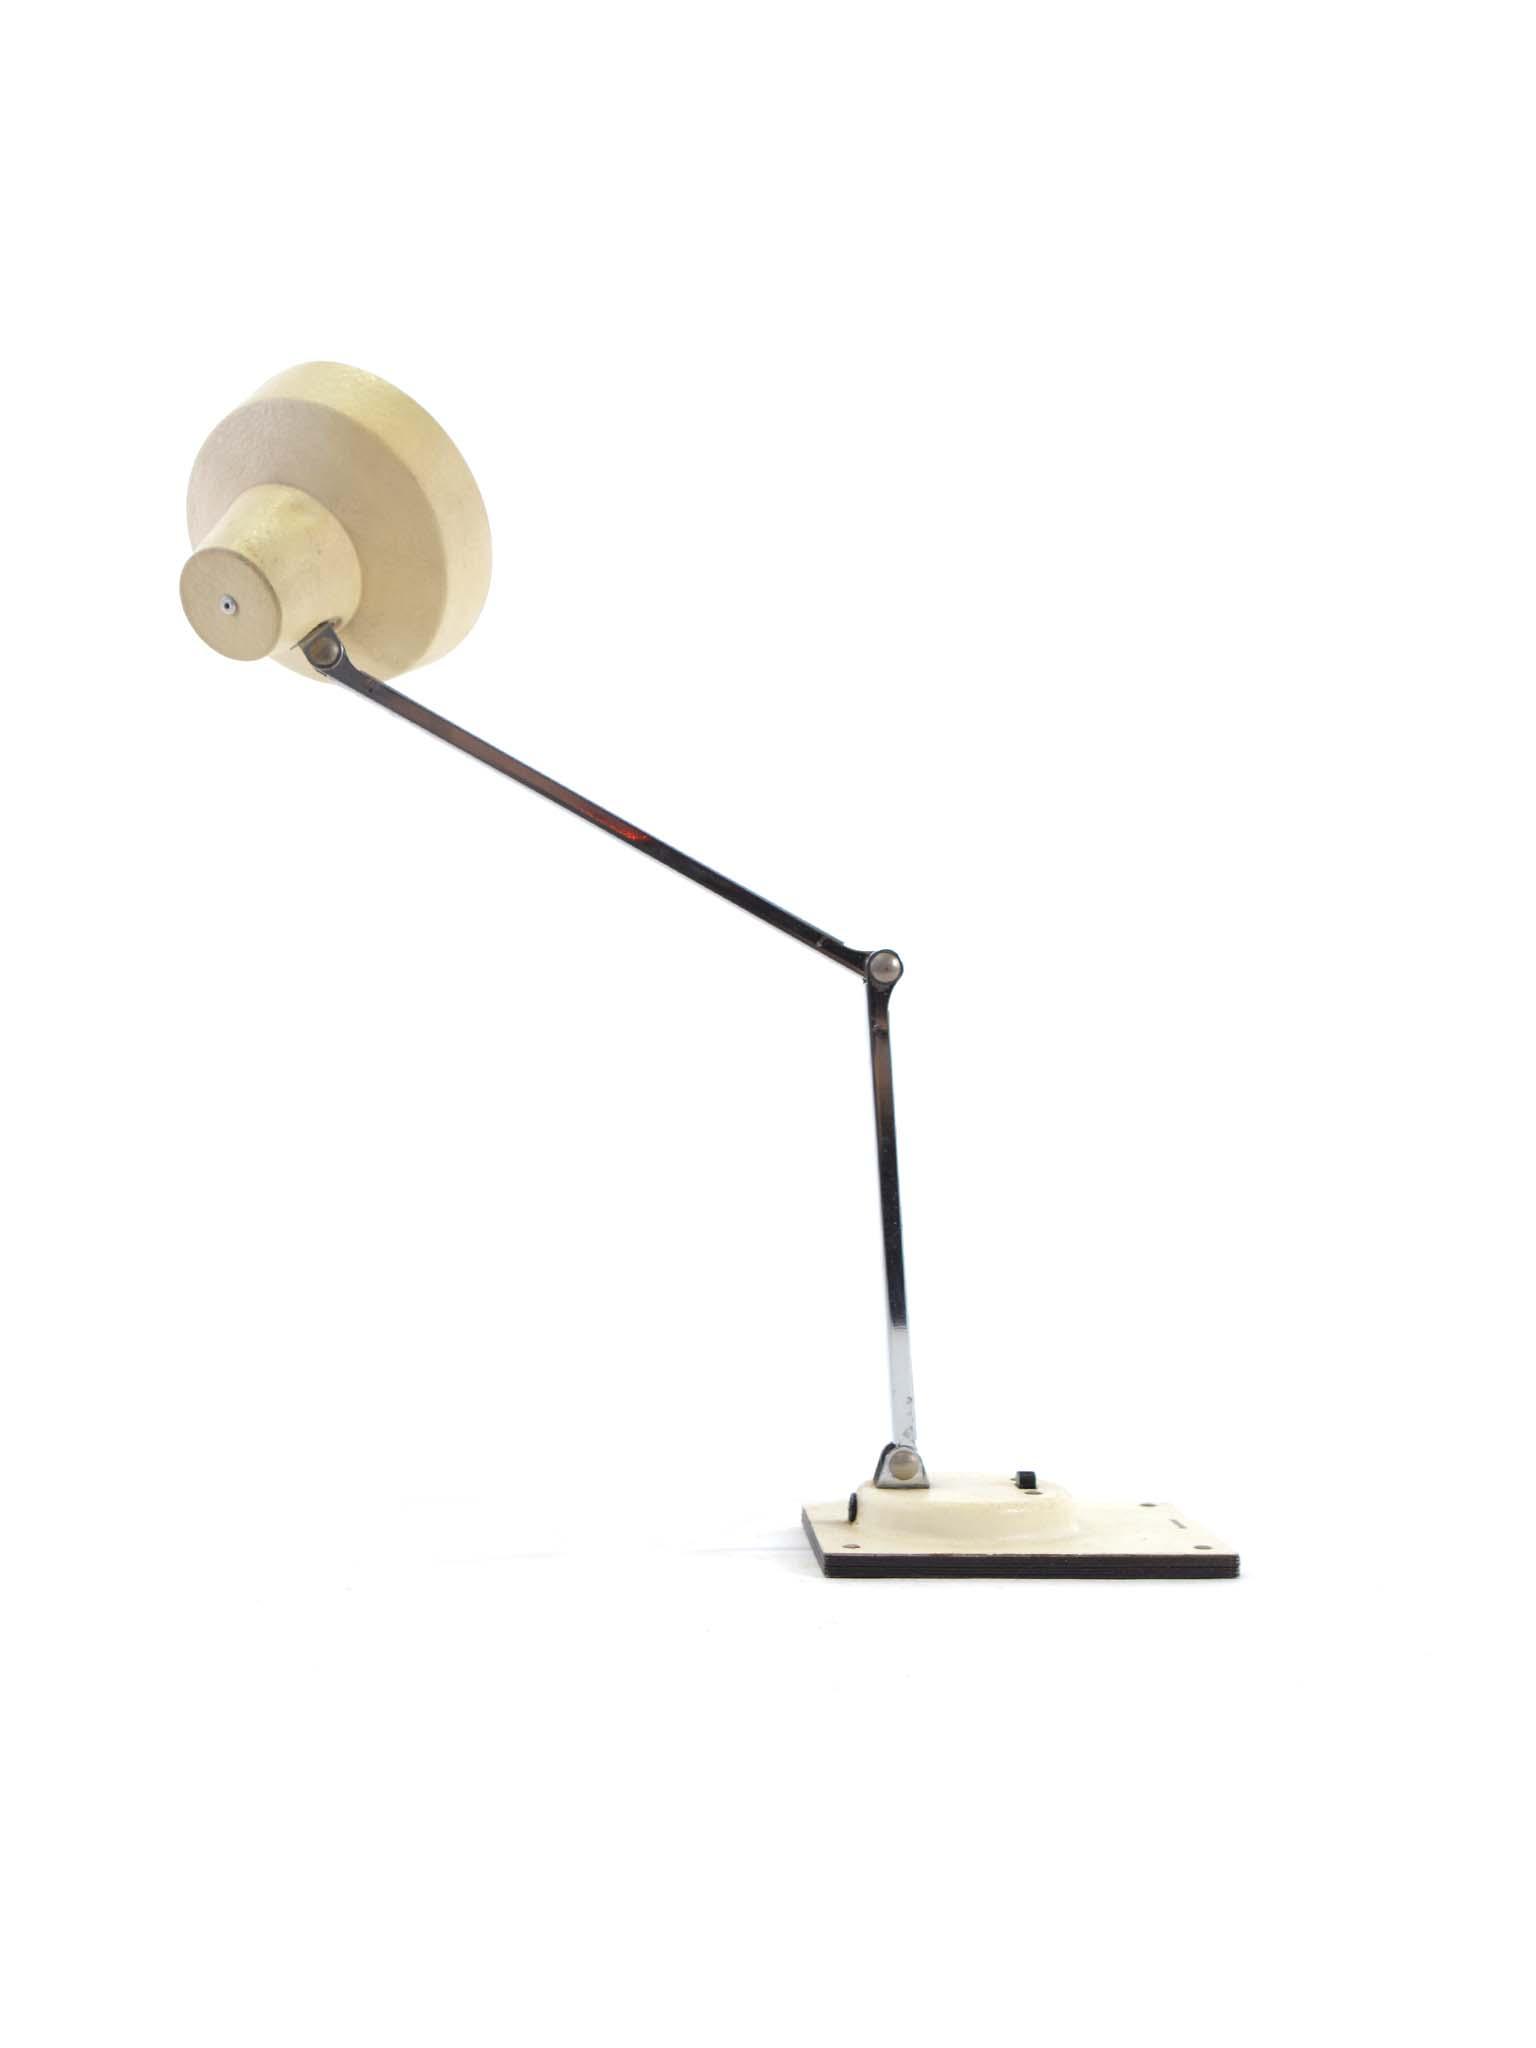 JAY MONROE DESK LAMP